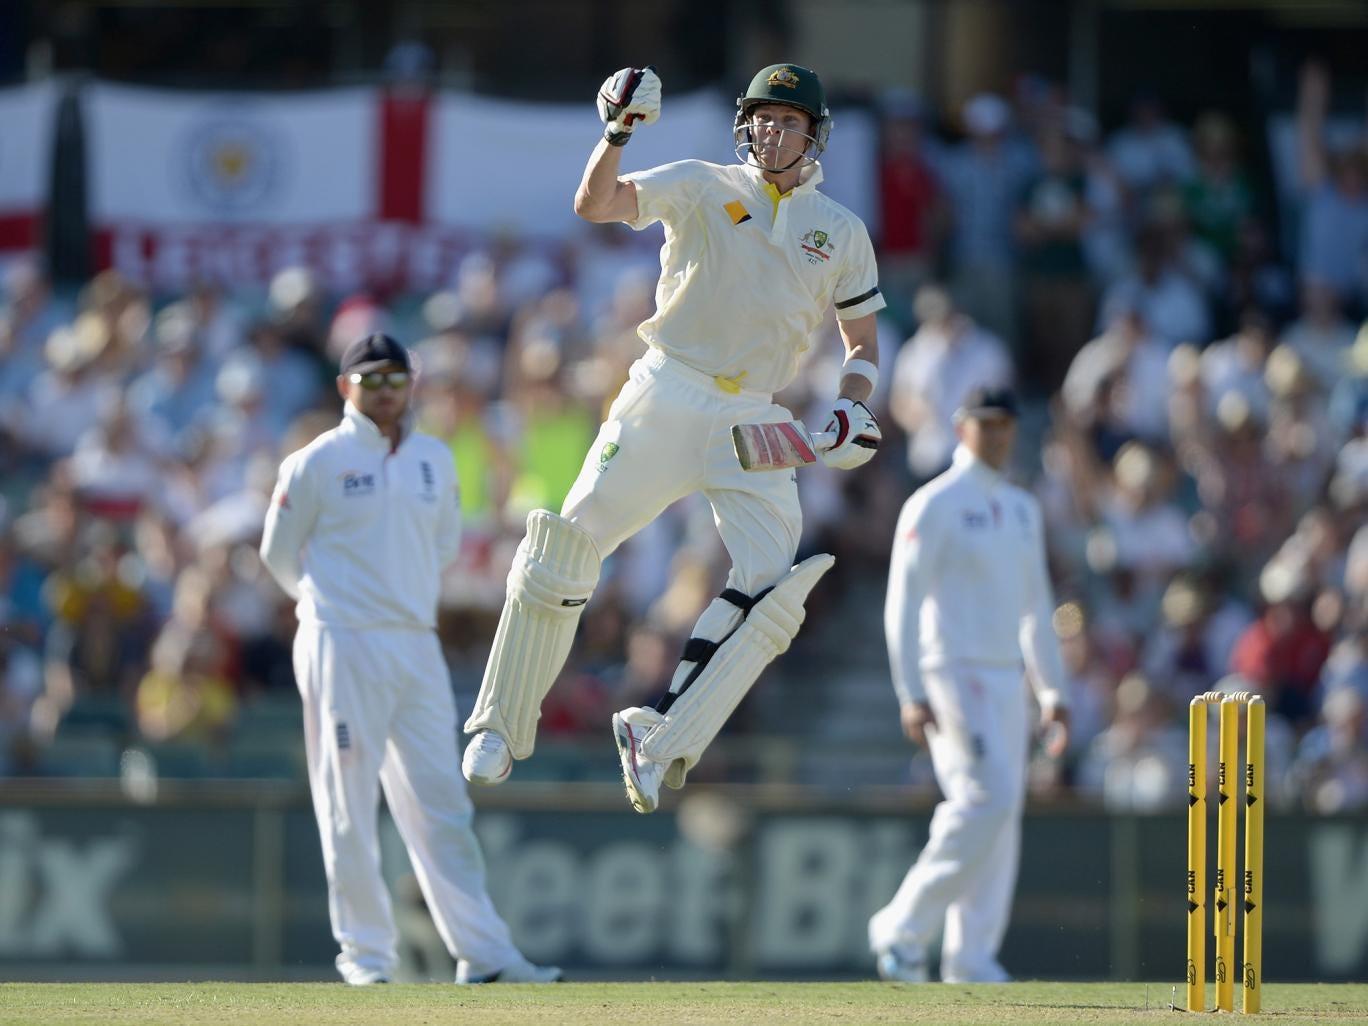 Australia batsman Steve Smith celebrates after reaching his century